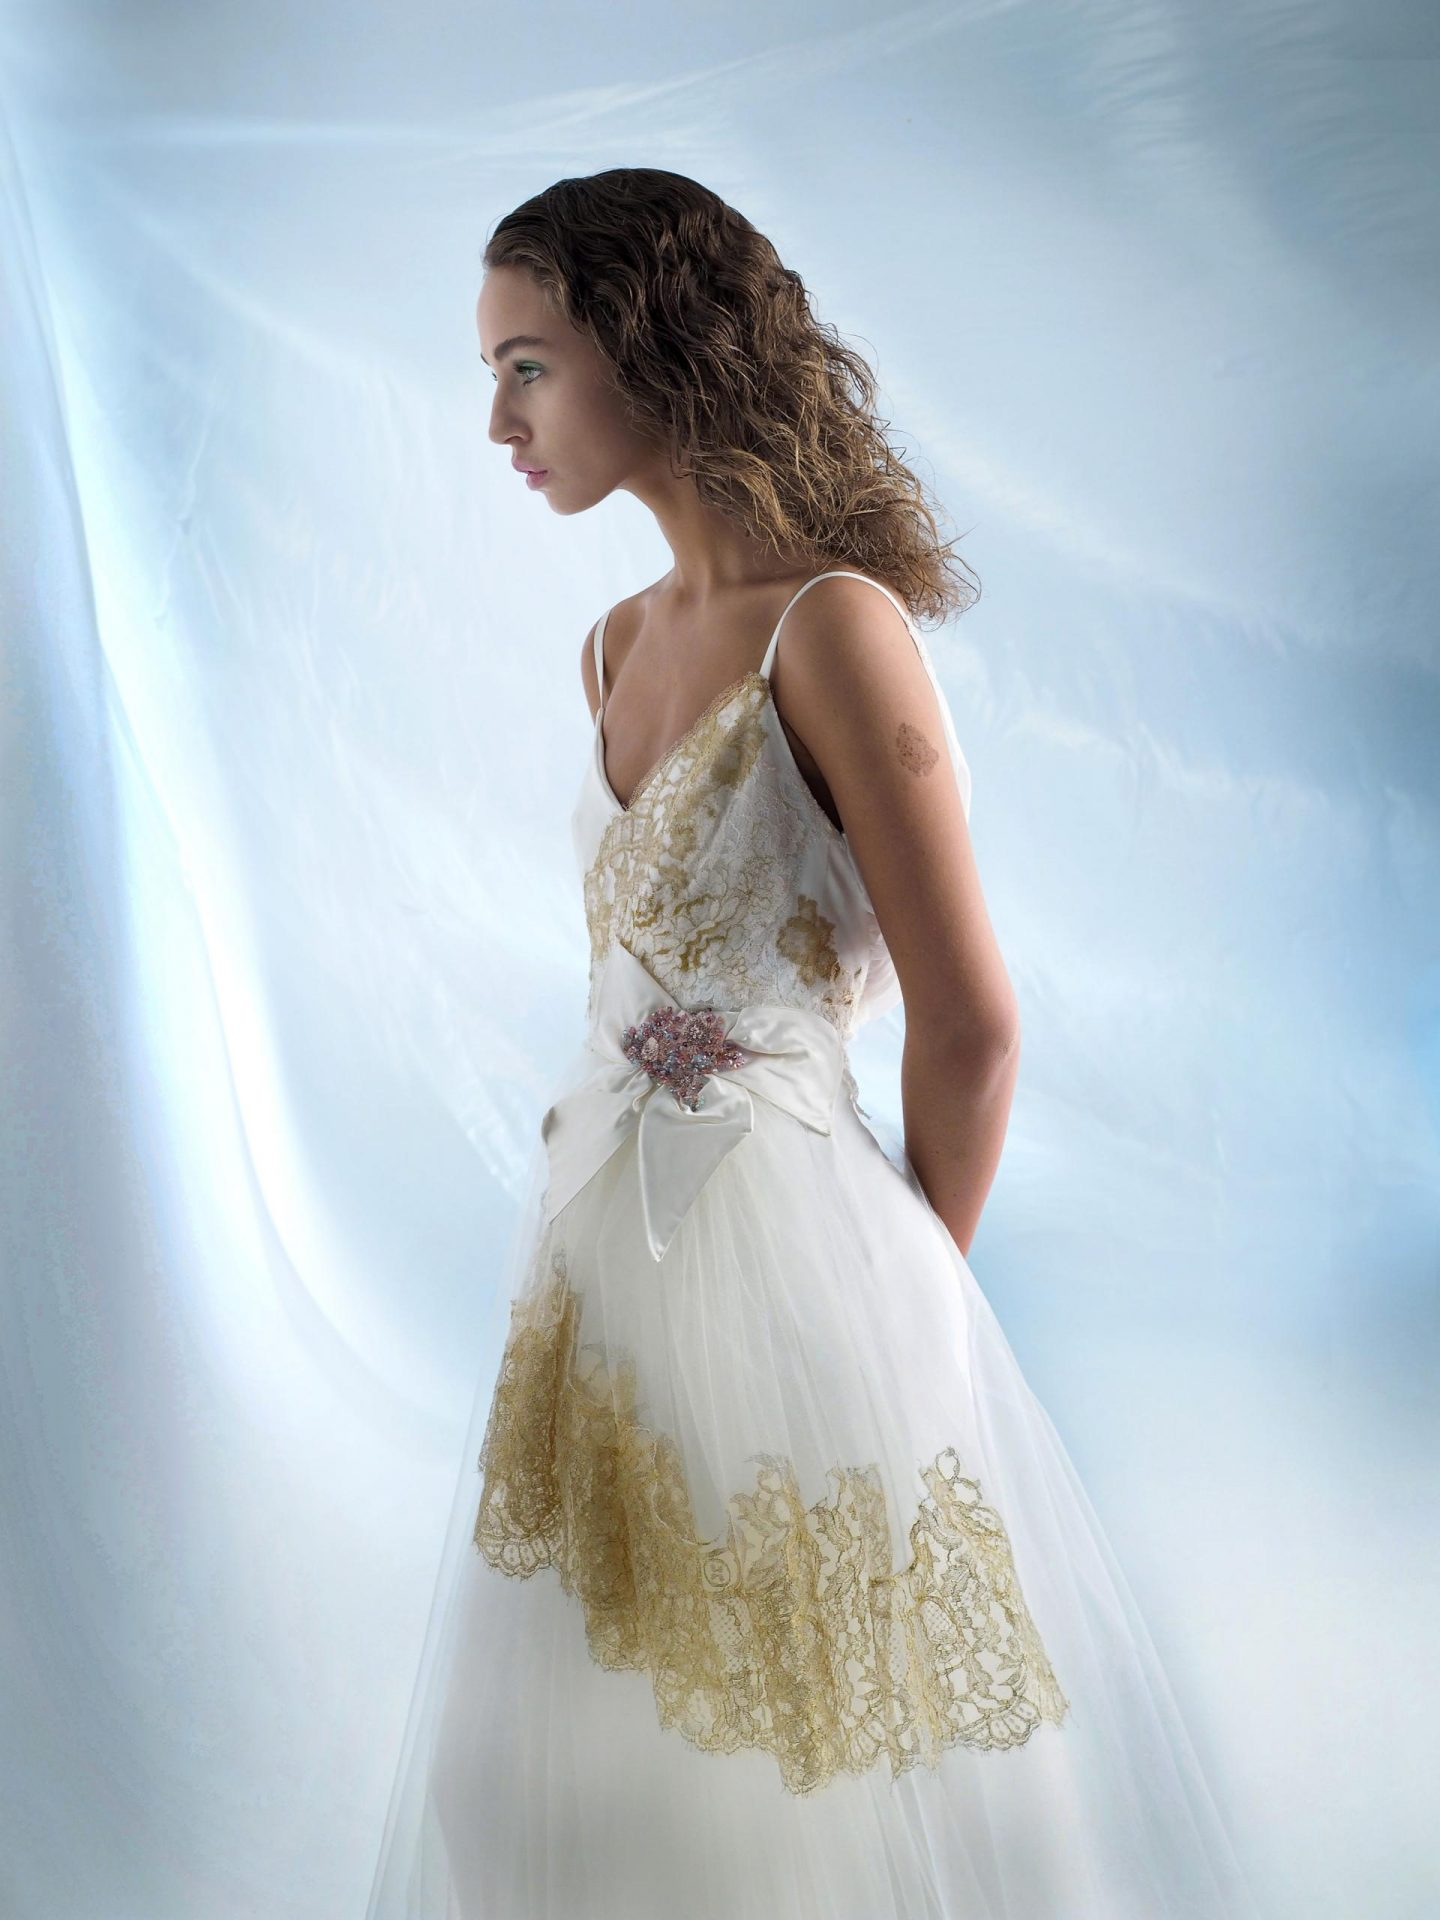 Interview with Designer Delphine Grandjouan